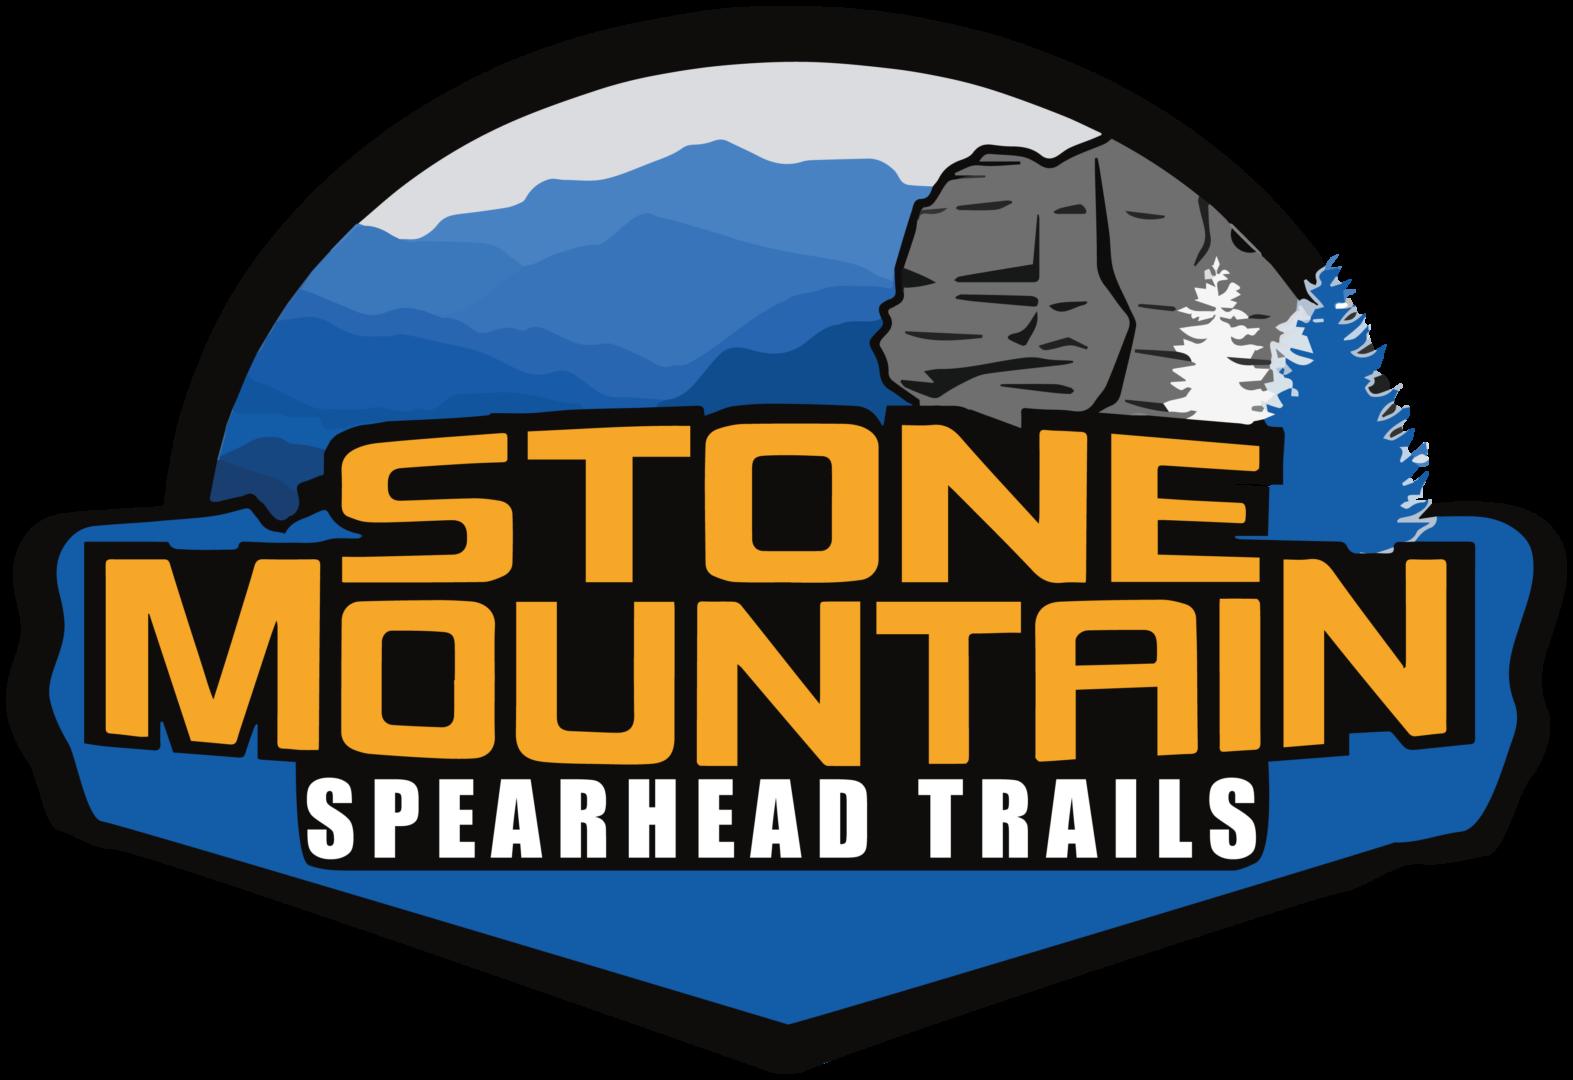 https://secureservercdn.net/198.71.233.199/798.e5e.myftpupload.com/wp-content/uploads/2020/07/Stone-Mountain.png